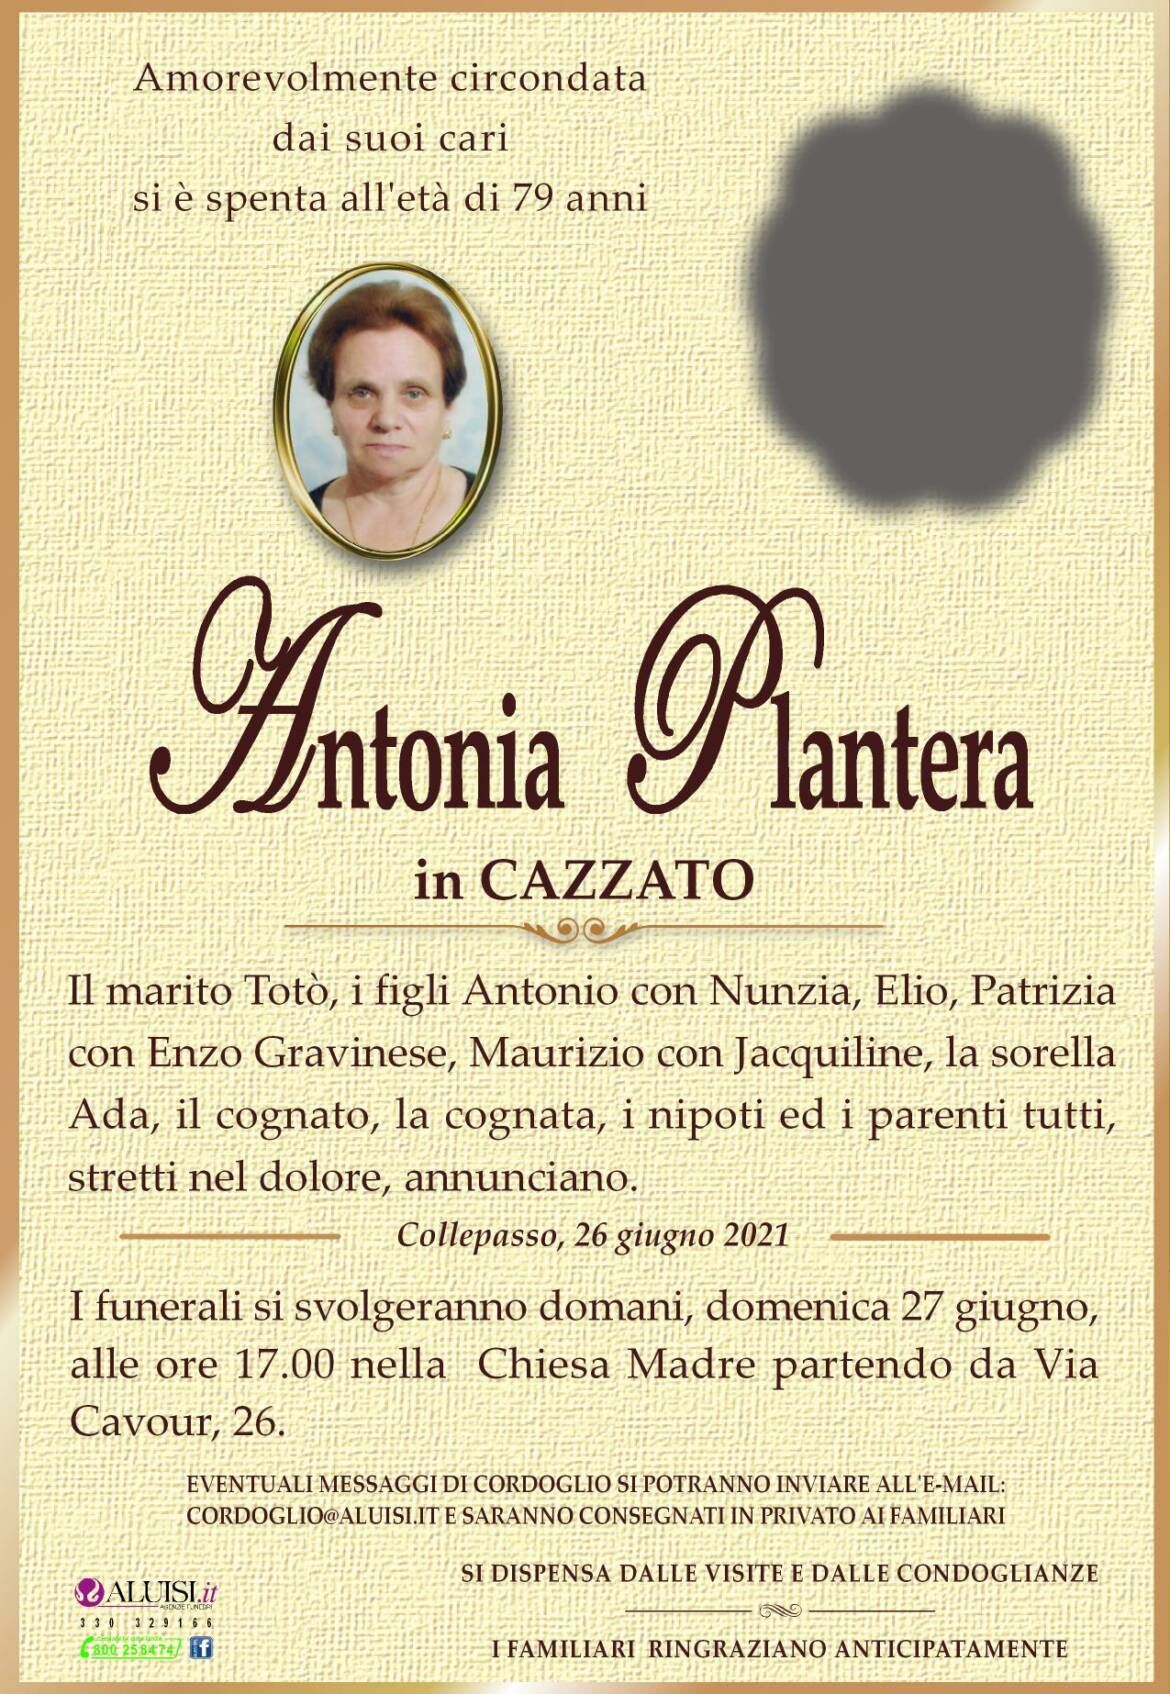 Annuncio-Antonia-Plantera-Cazzato-Elio.jpg